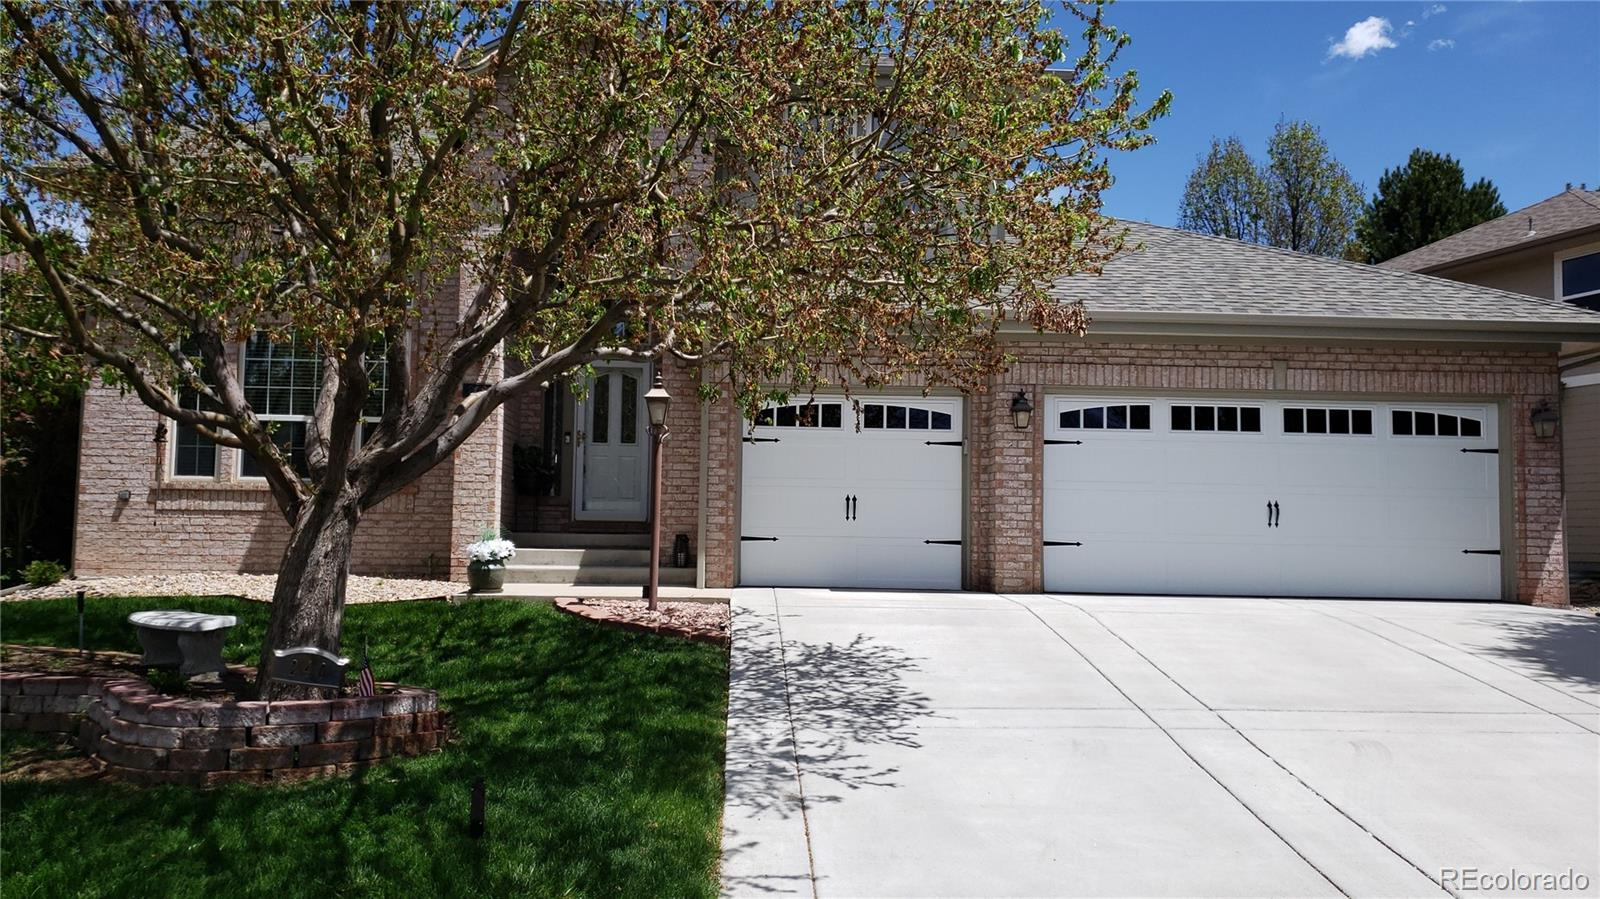 MLS# 7352042 - 1 - 240 Sylvestor Place, Highlands Ranch, CO 80129